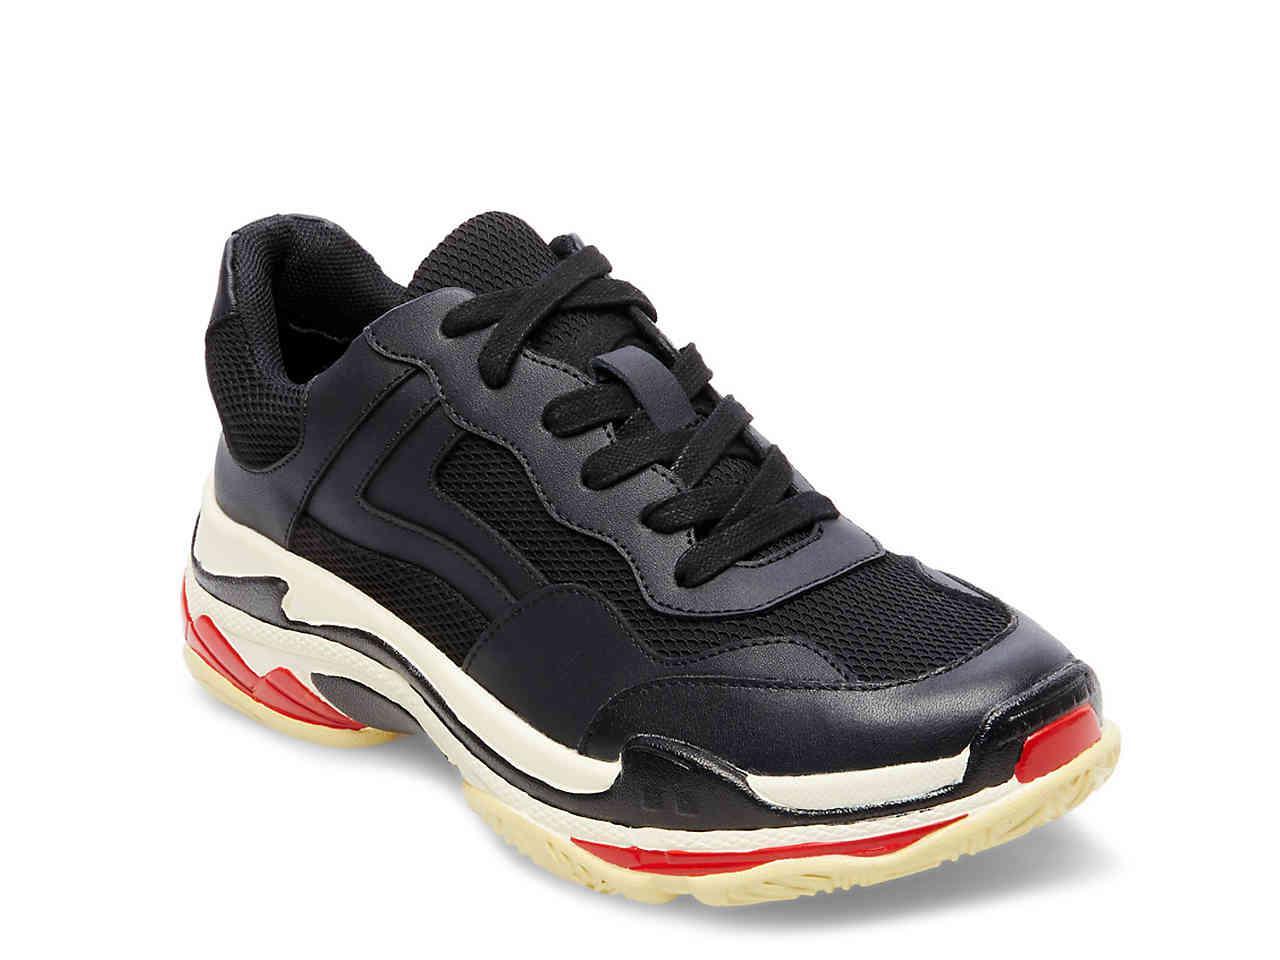 9abd12c7eee Lyst - Steve Madden Nassau Sneaker in Black